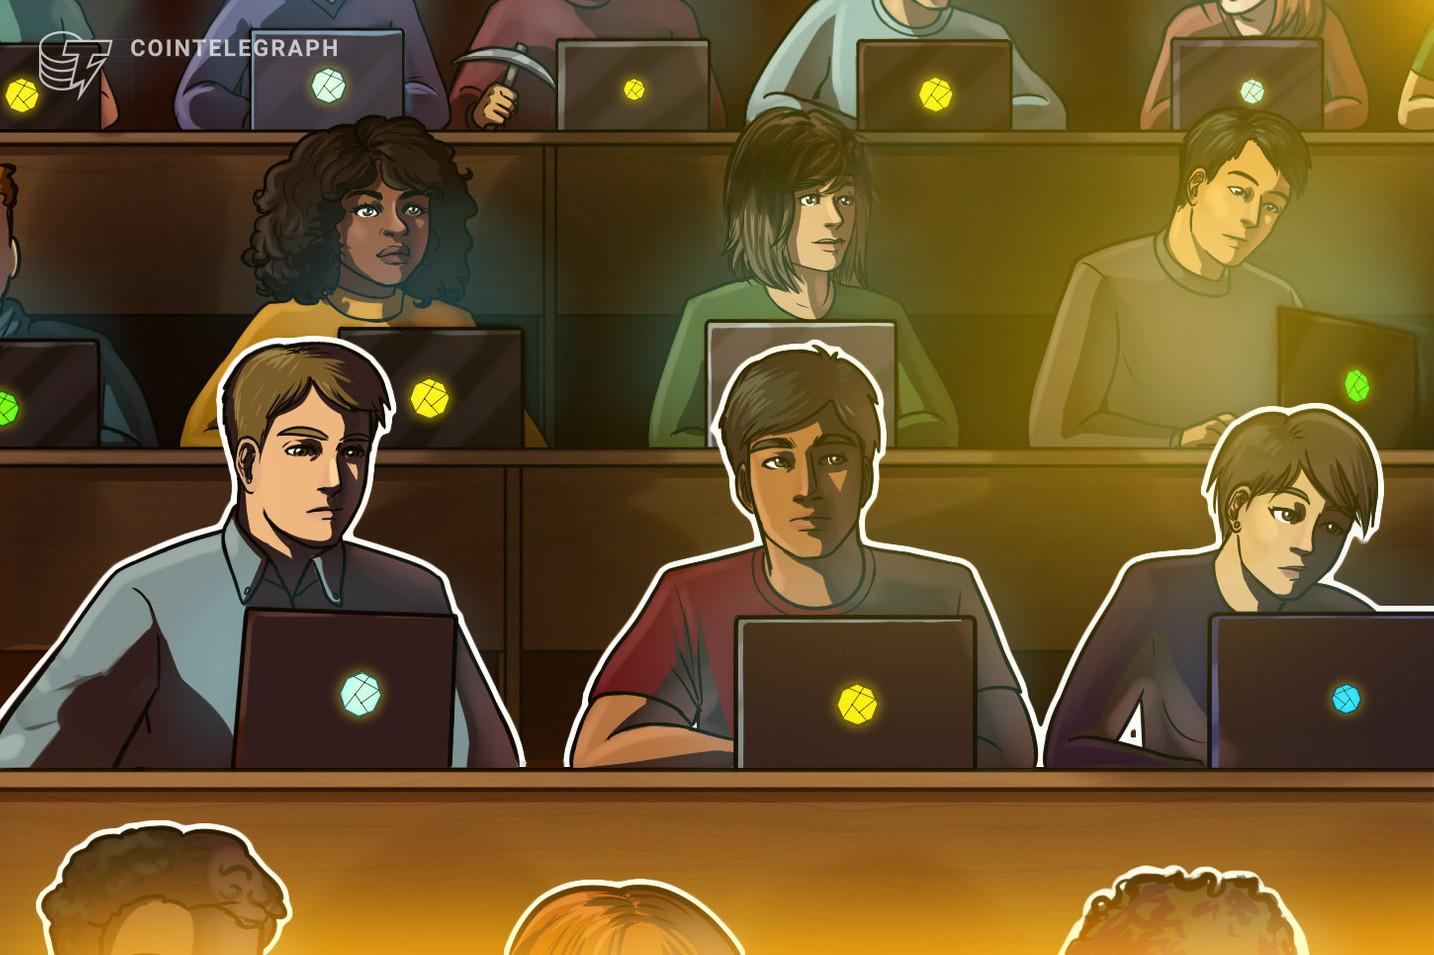 Canadian University Adds Two Blockchain Programs to Meet Job Demands